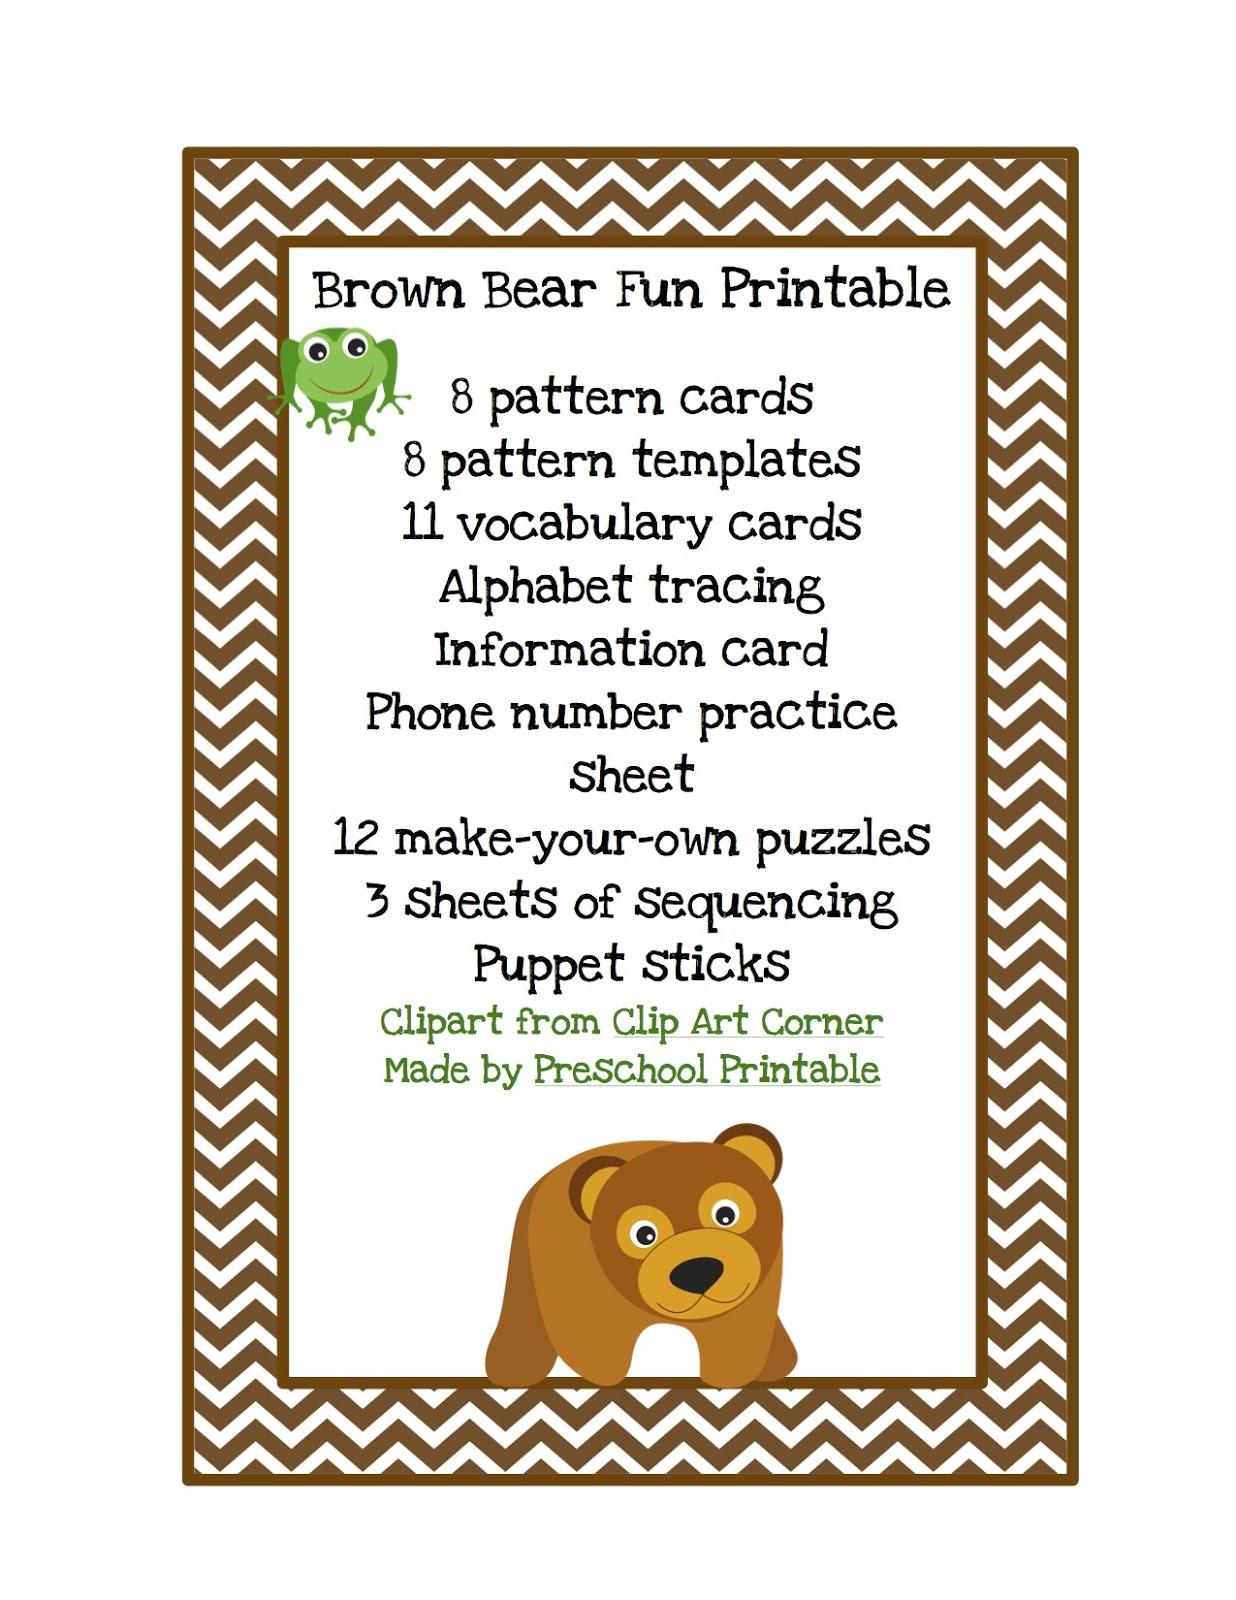 Brown Bear Fun Printable Preschool Printables